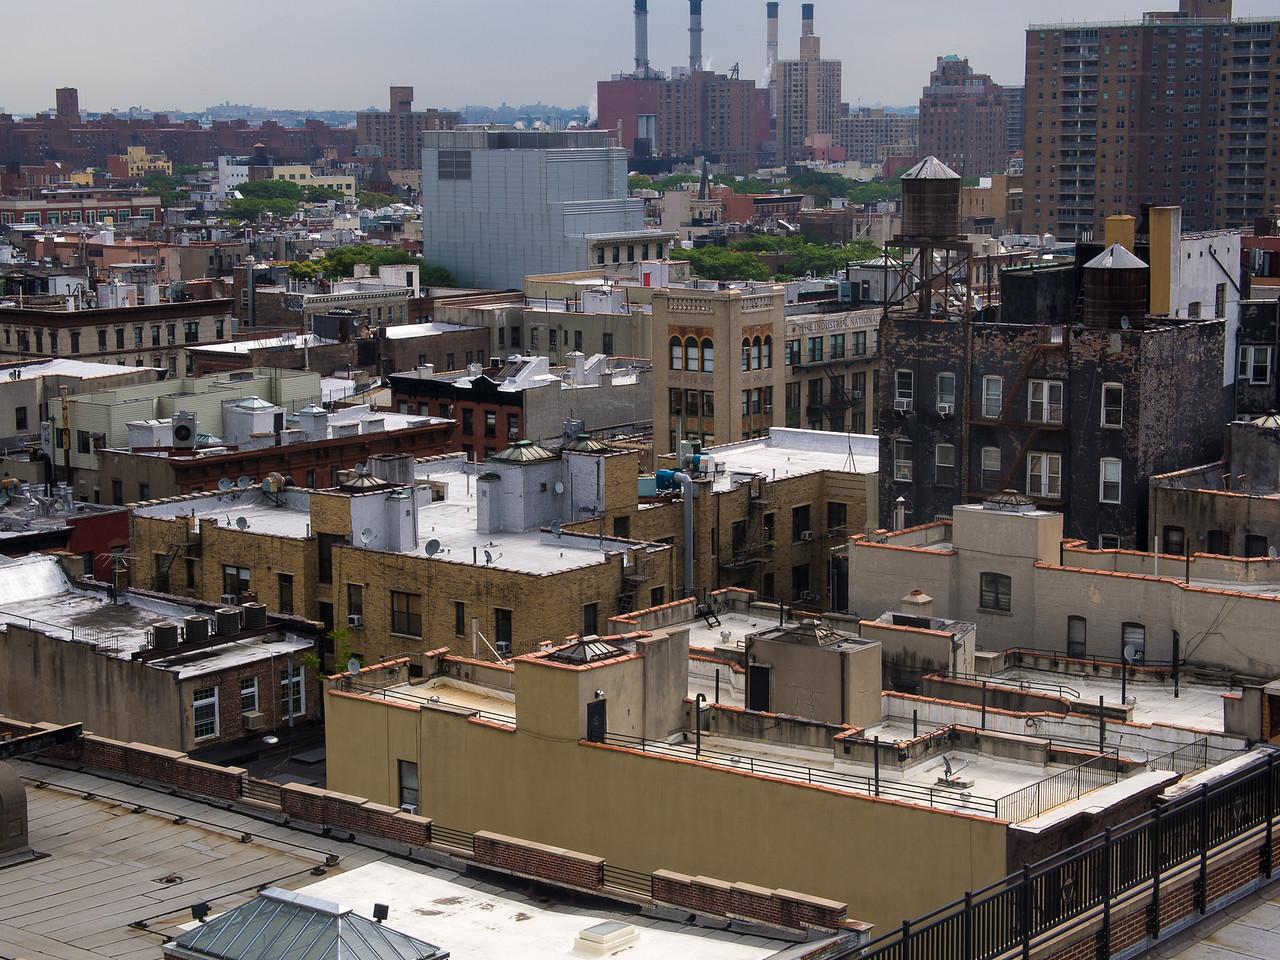 Lower East Village Rooftops